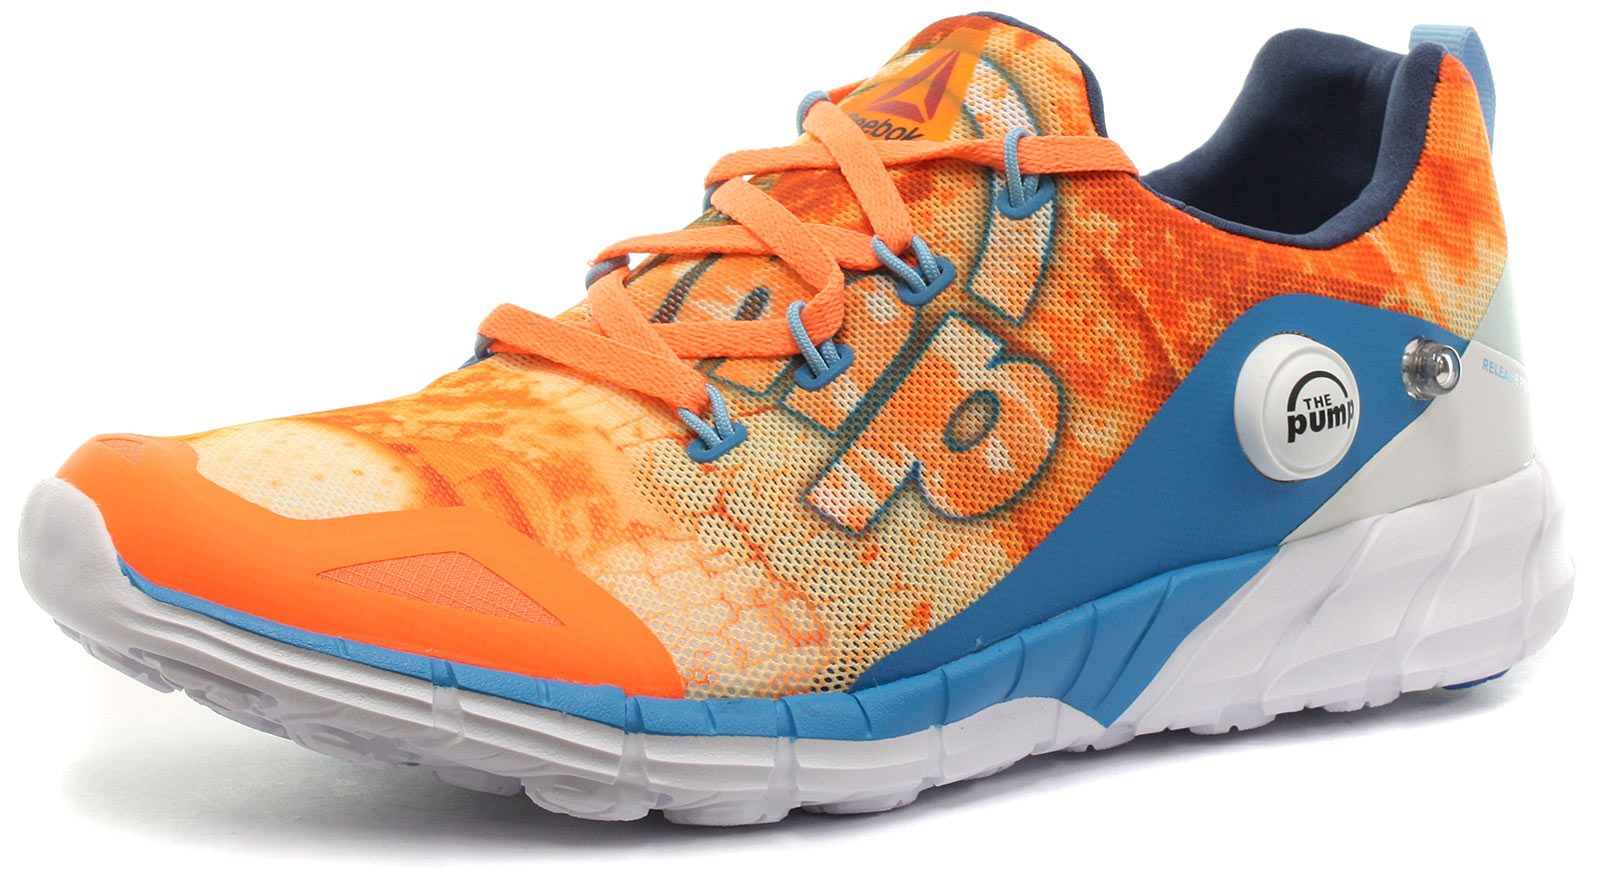 fc4f5c152a Reebok ZPump Fusion 2.0 Dunes Orange Womens Running Shoes, US Size 6